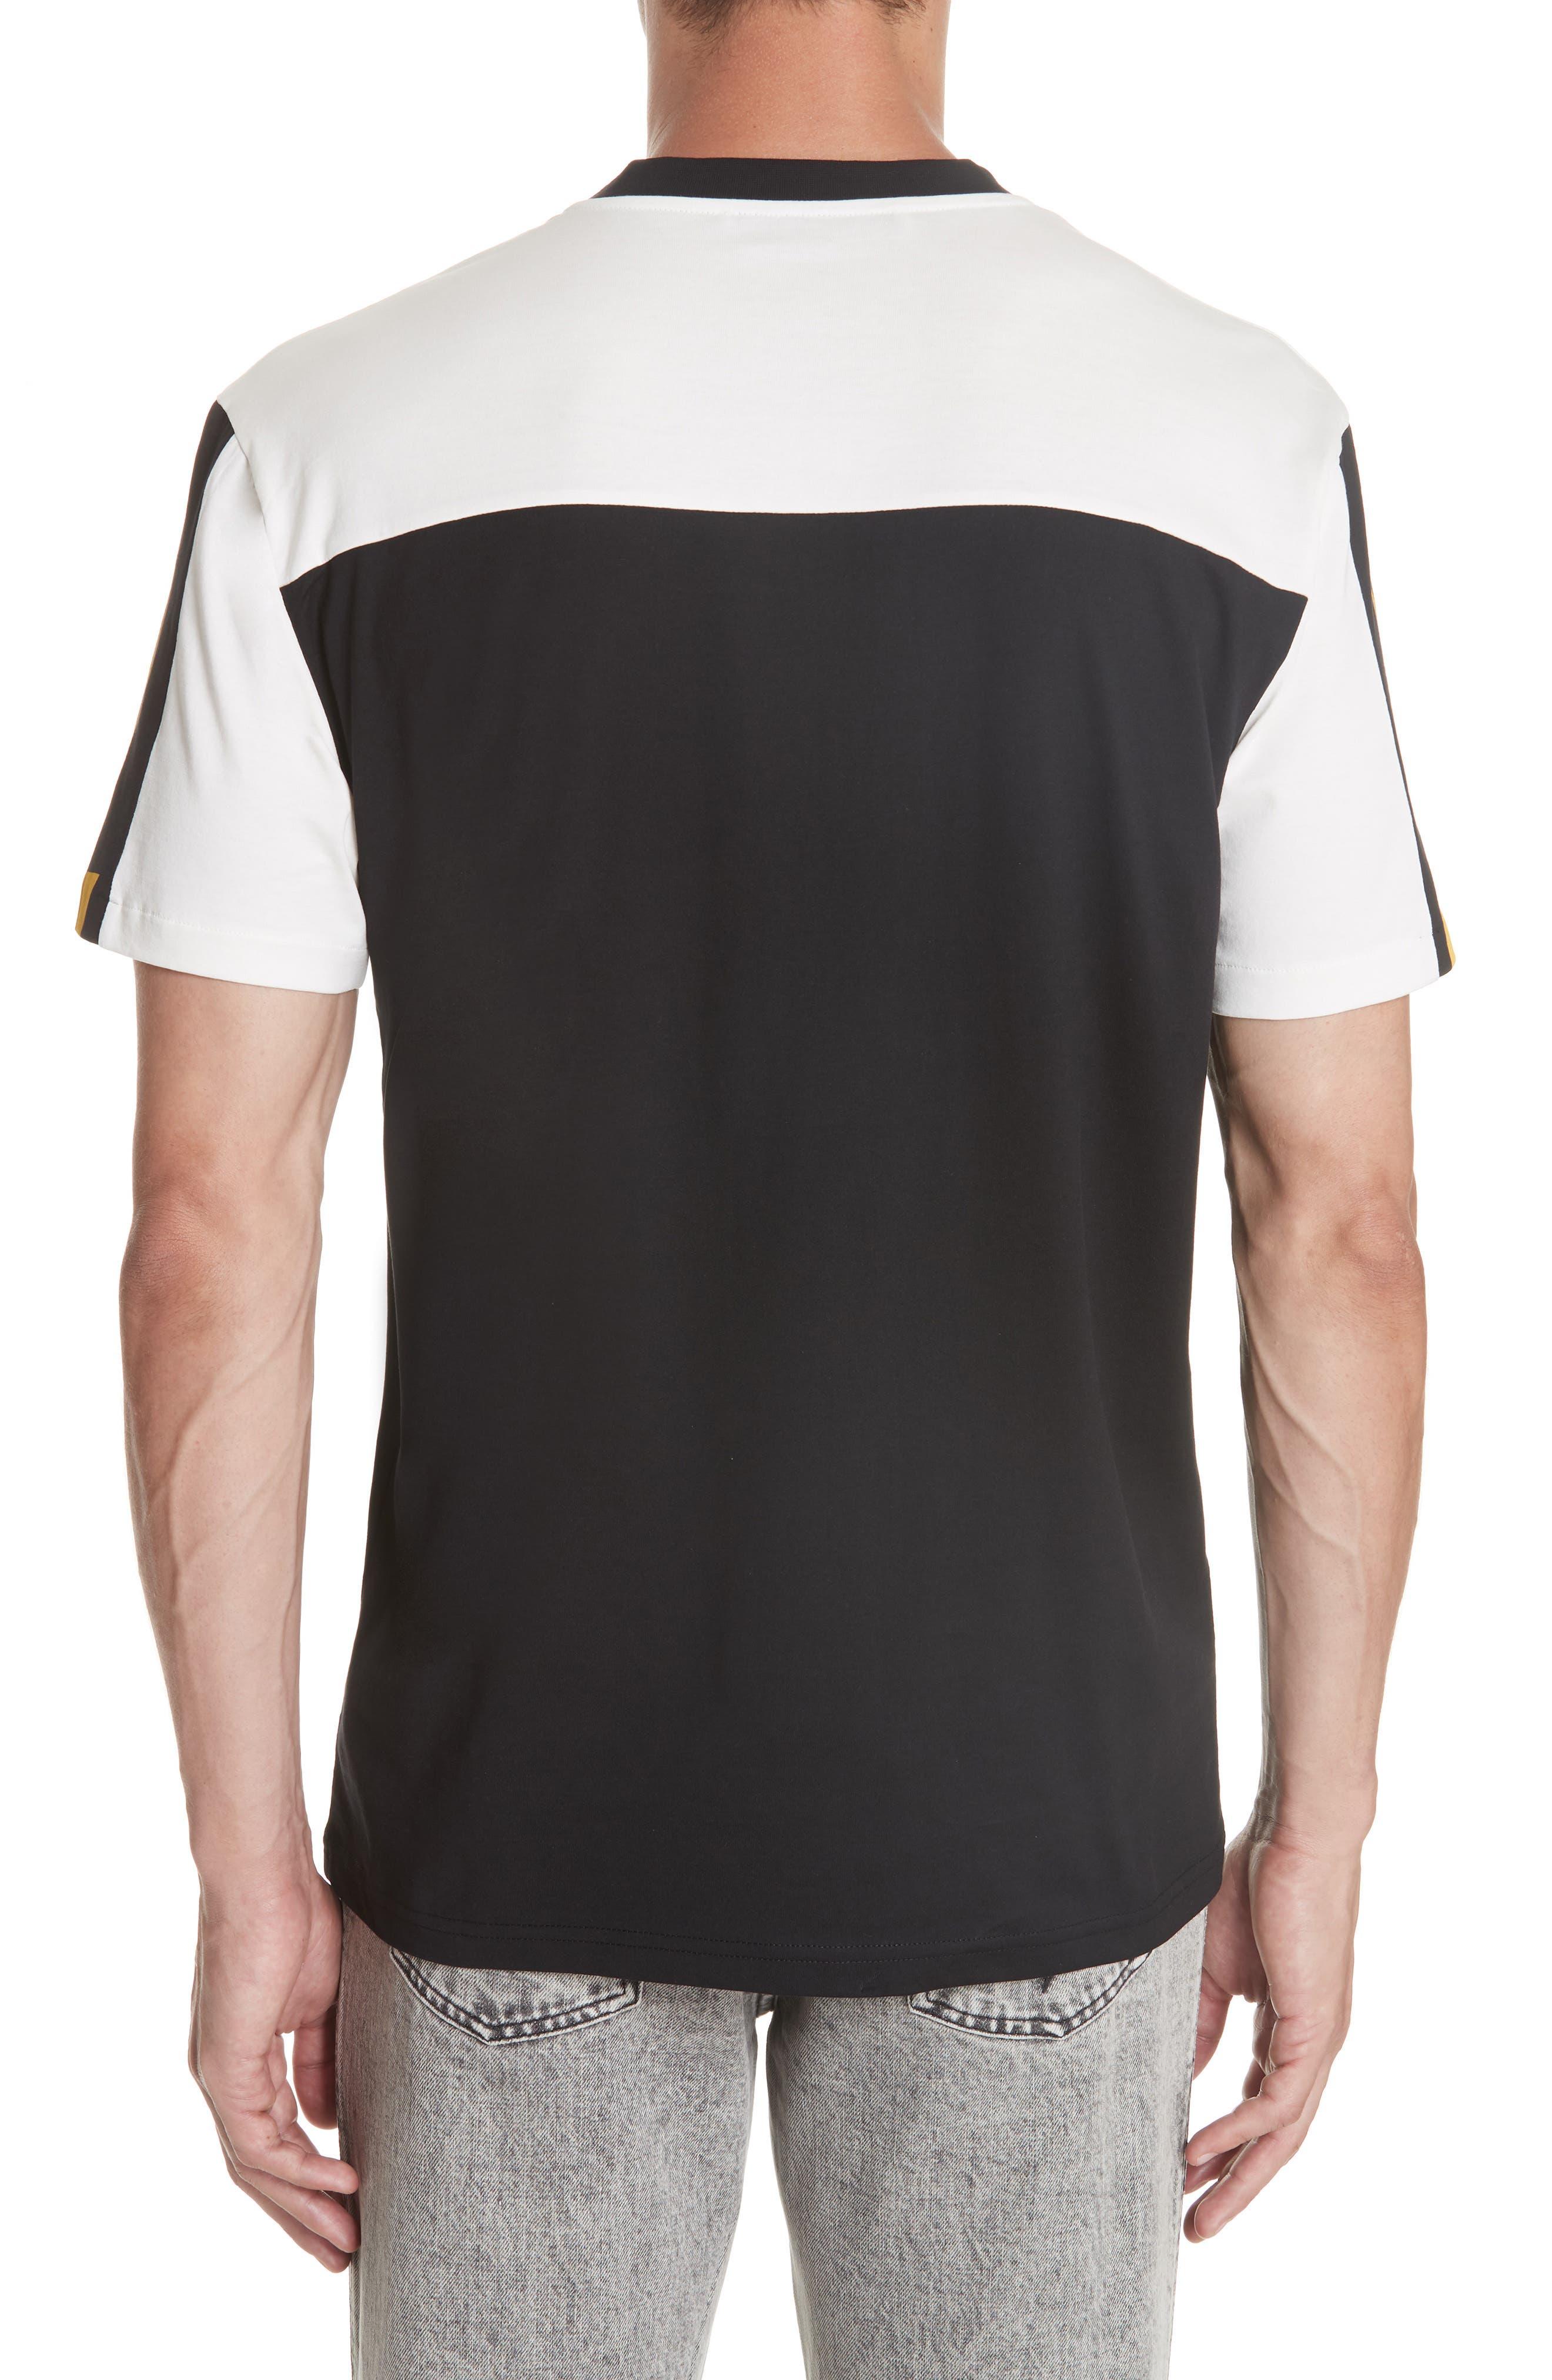 Fast Love Graphic T-Shirt,                             Alternate thumbnail 2, color,                             Black/ Beige